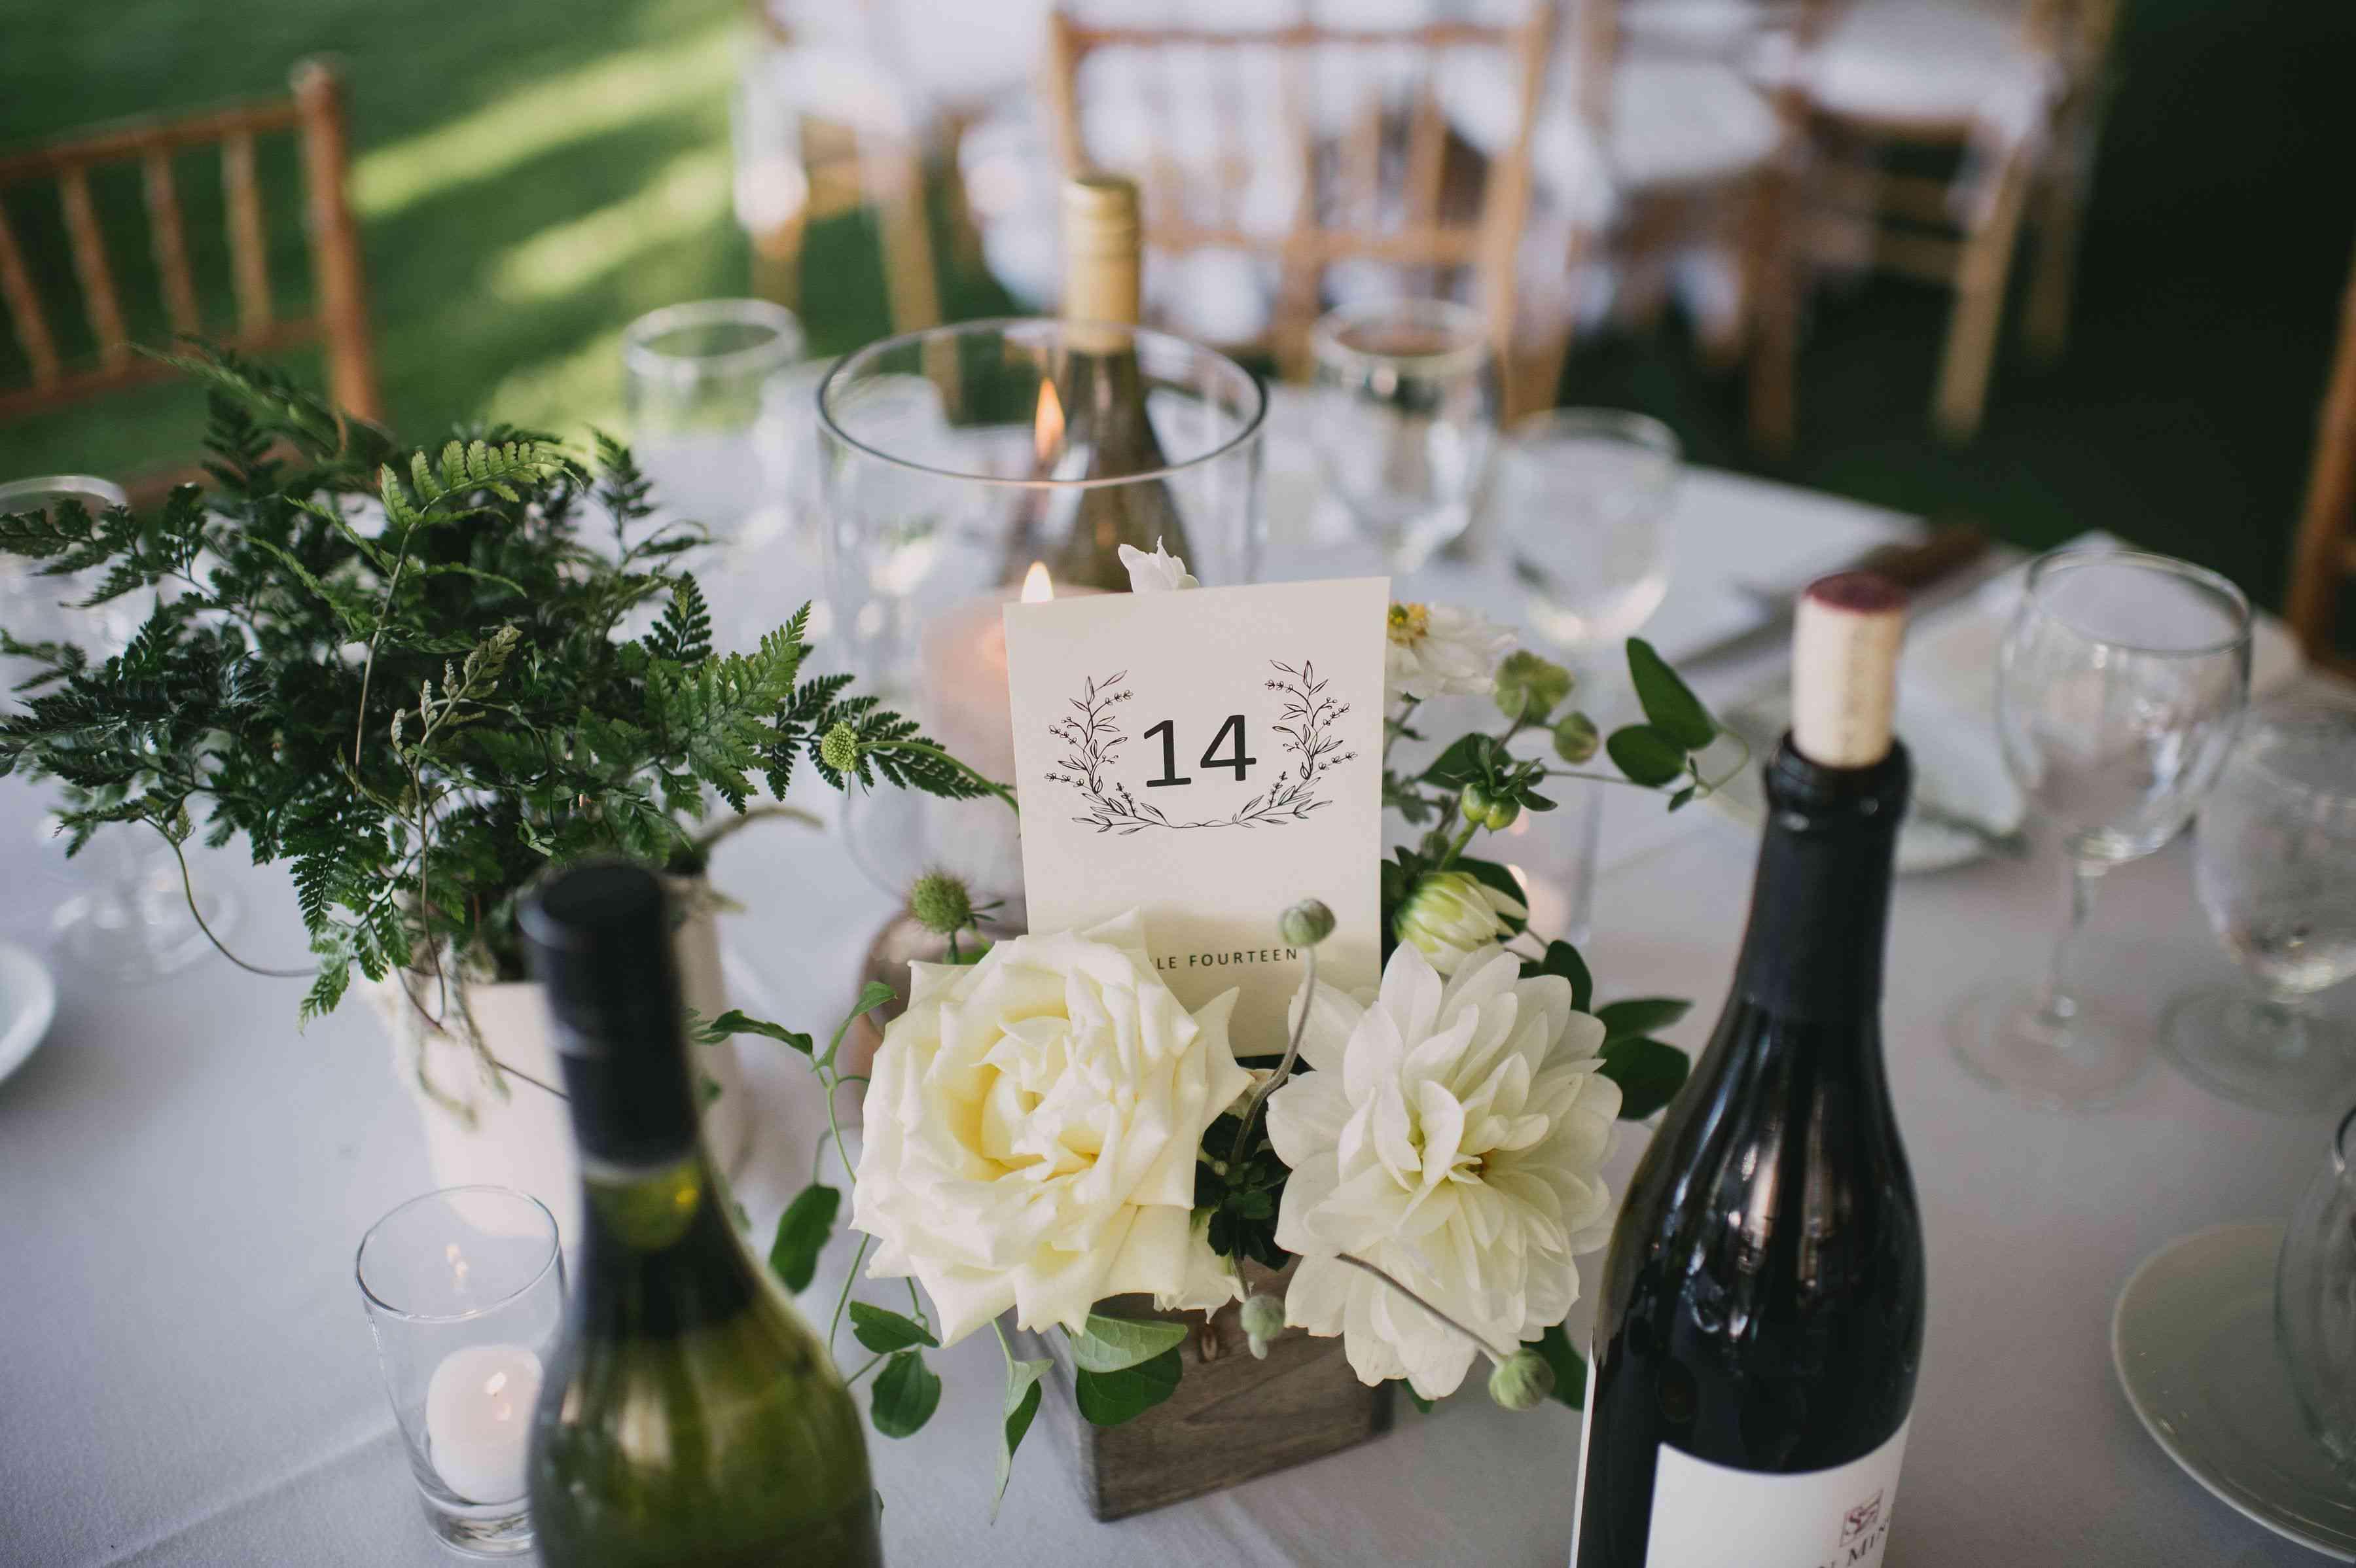 Table number in floral arrangement